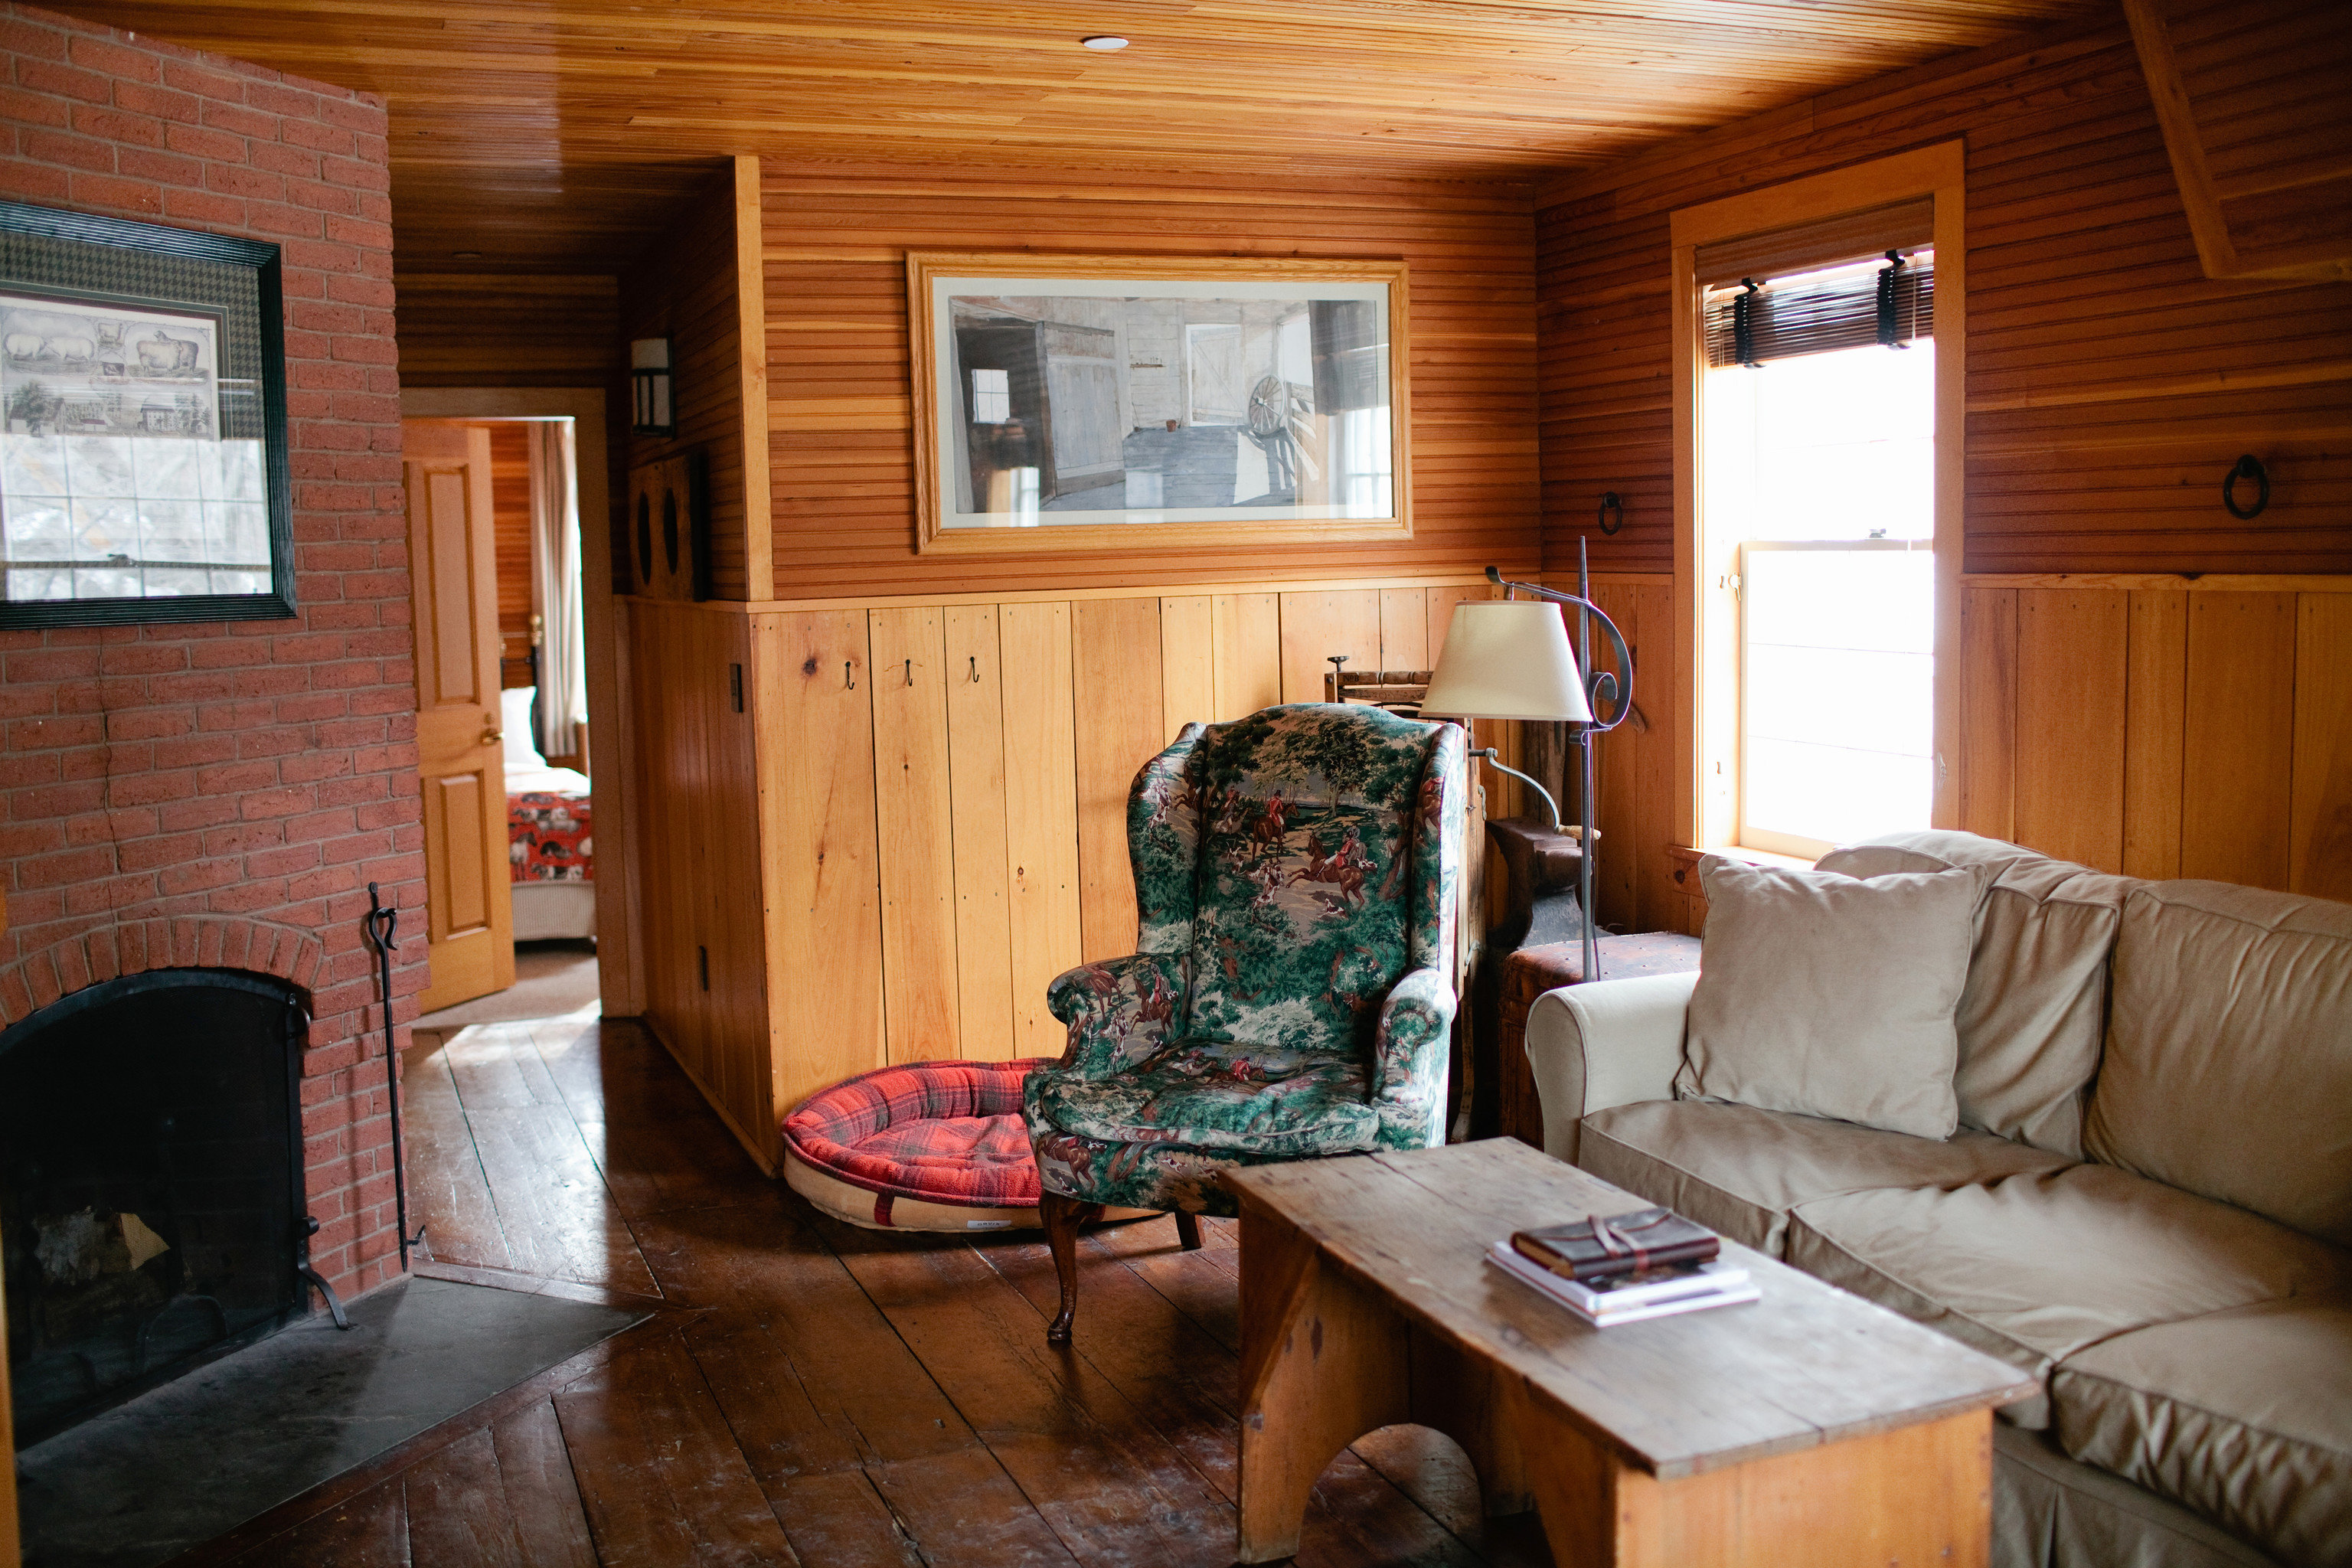 property home house log cabin cottage Kitchen living room vehicle art farmhouse